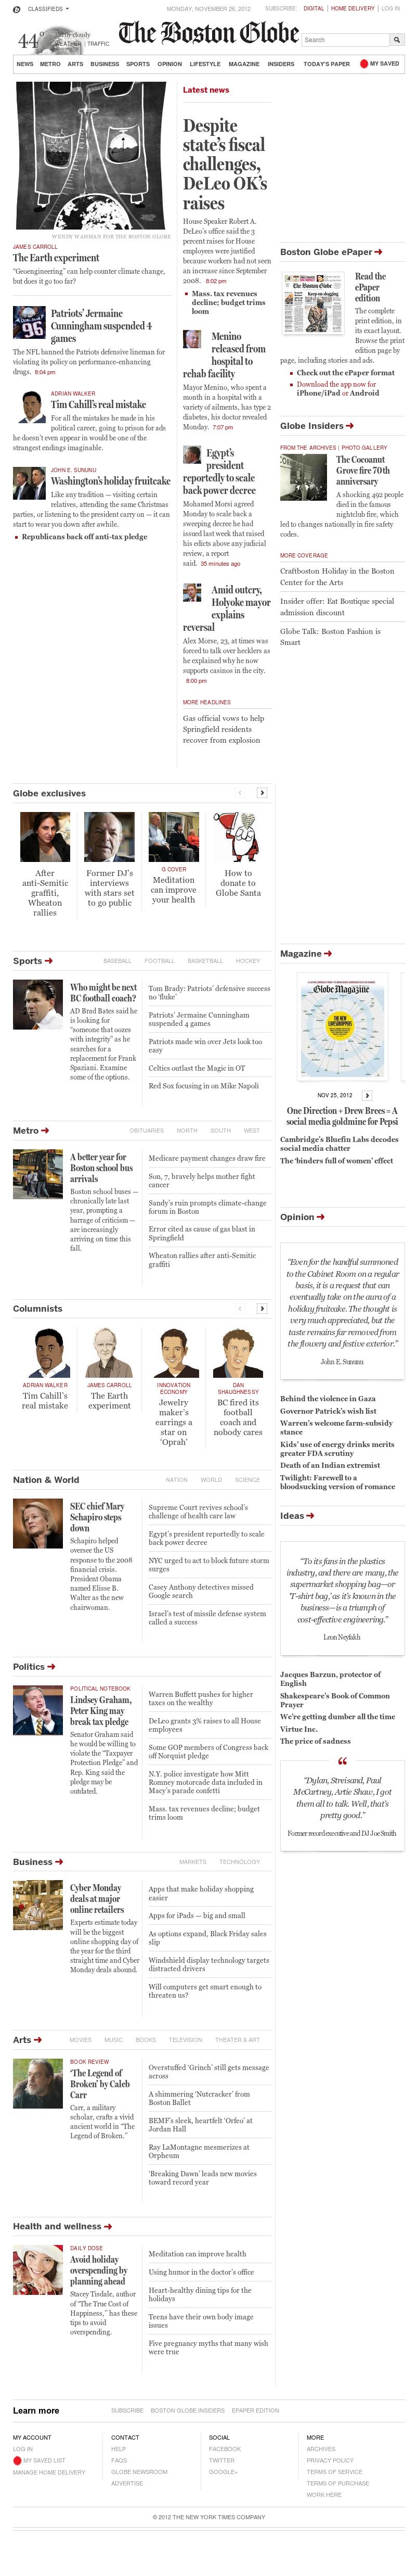 The Boston Globe at Monday Nov. 26, 2012, 10:02 p.m. UTC